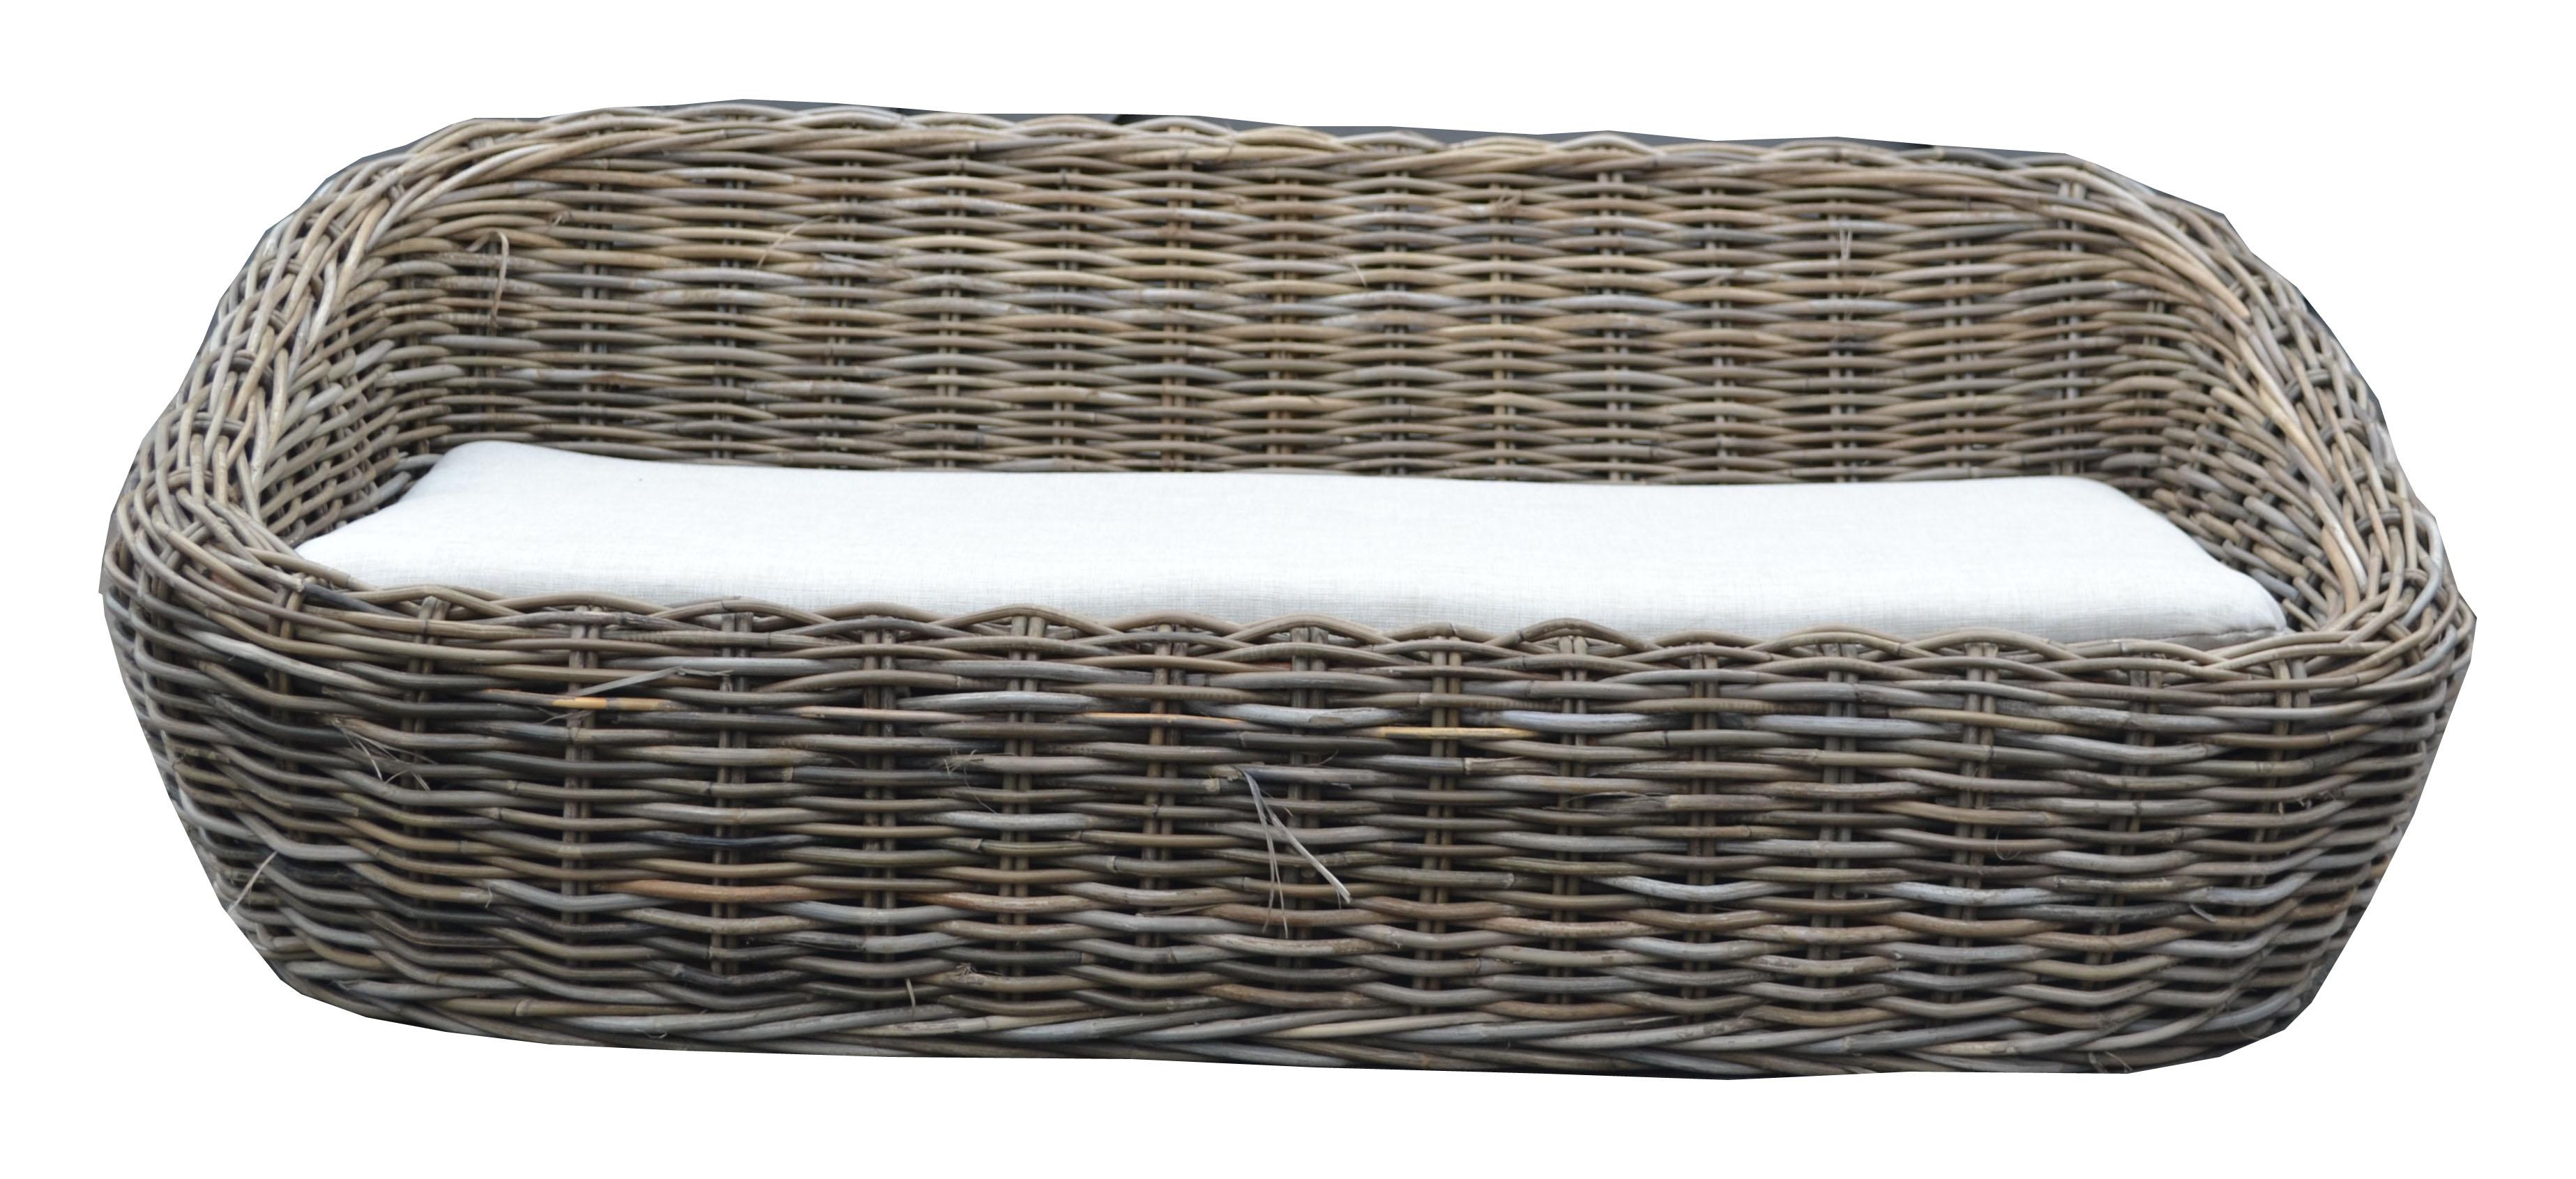 LRB14 #Kubu Rattan Dog Sofa Basket